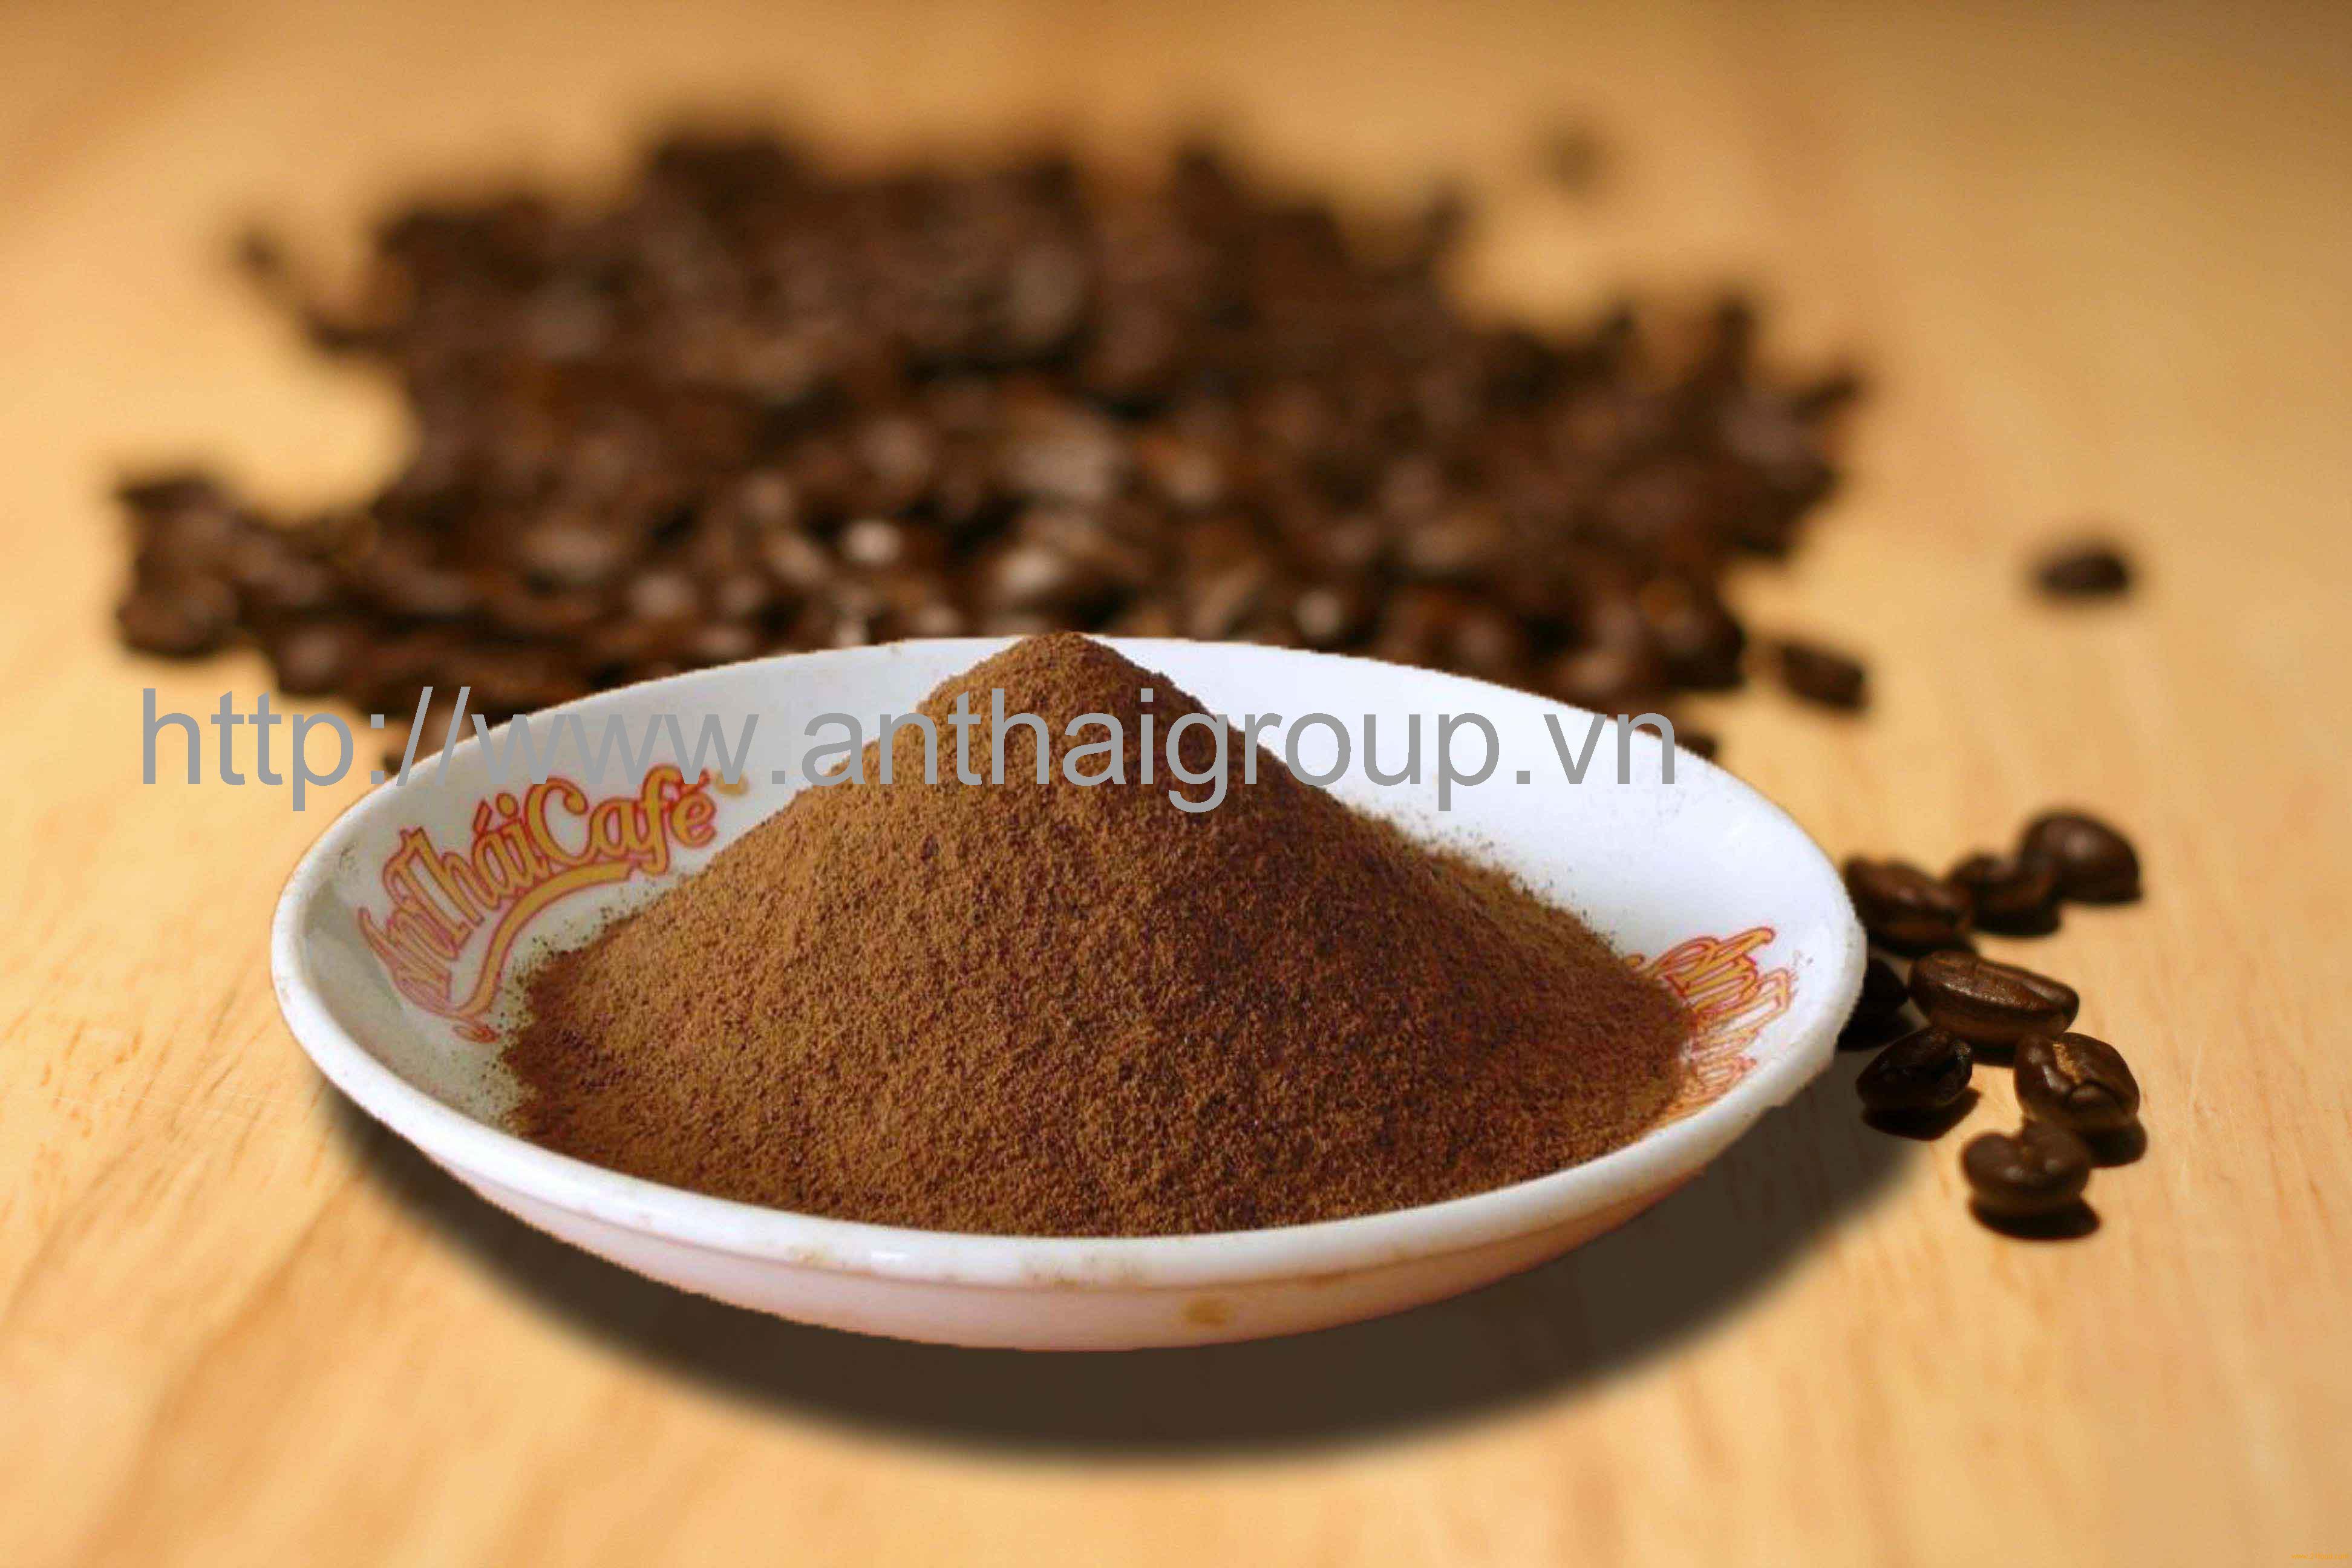 Instant Coffee Powder products,Vietnam Instant Coffee Powder supplier